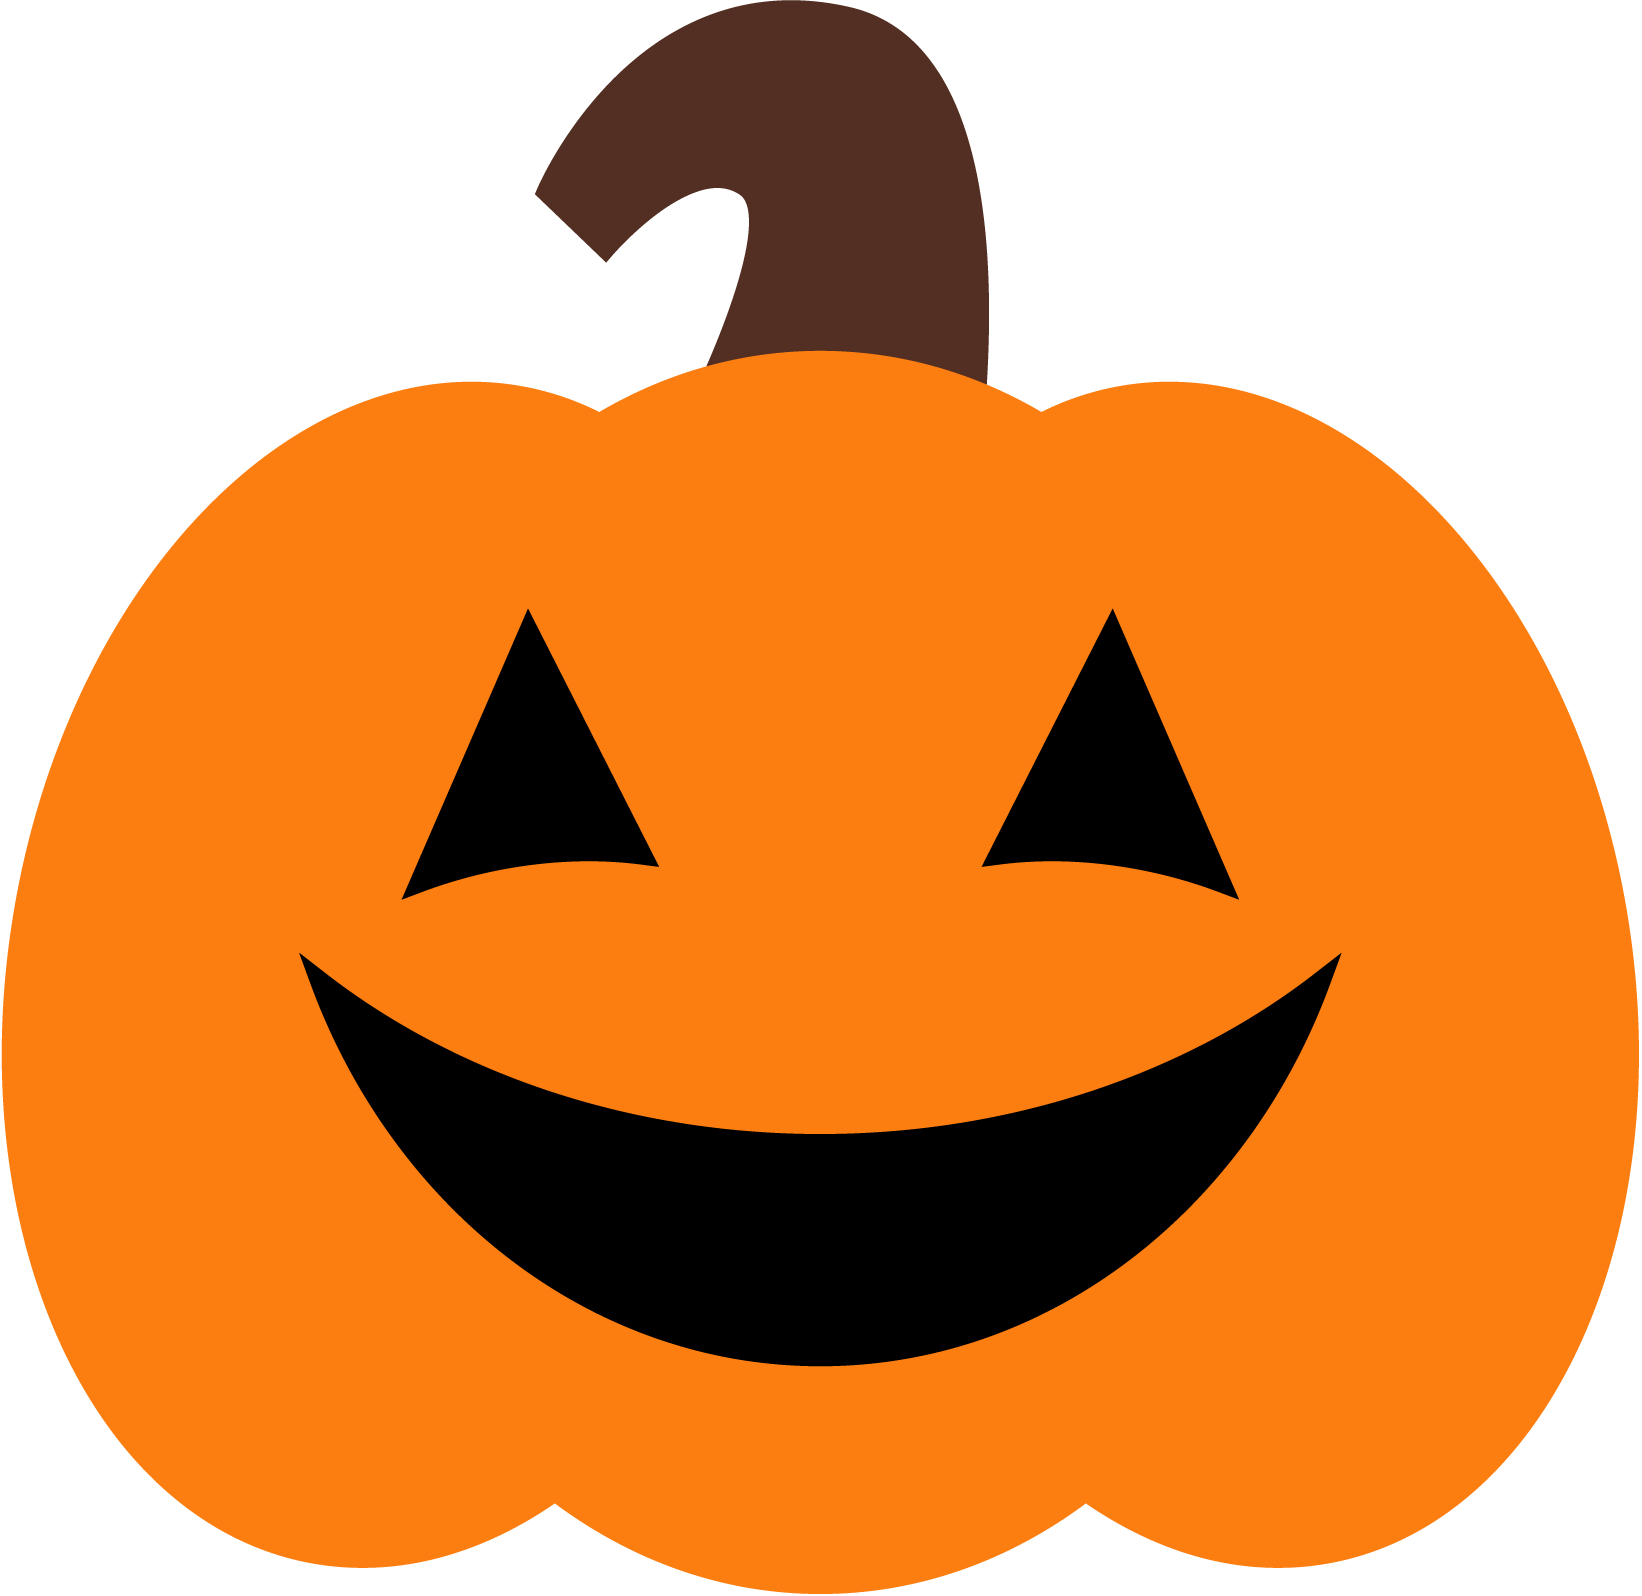 Pumpkin pie Jack-o-lantern Clip art - Happy Pumpkin ... (1642 x 1596 Pixel)